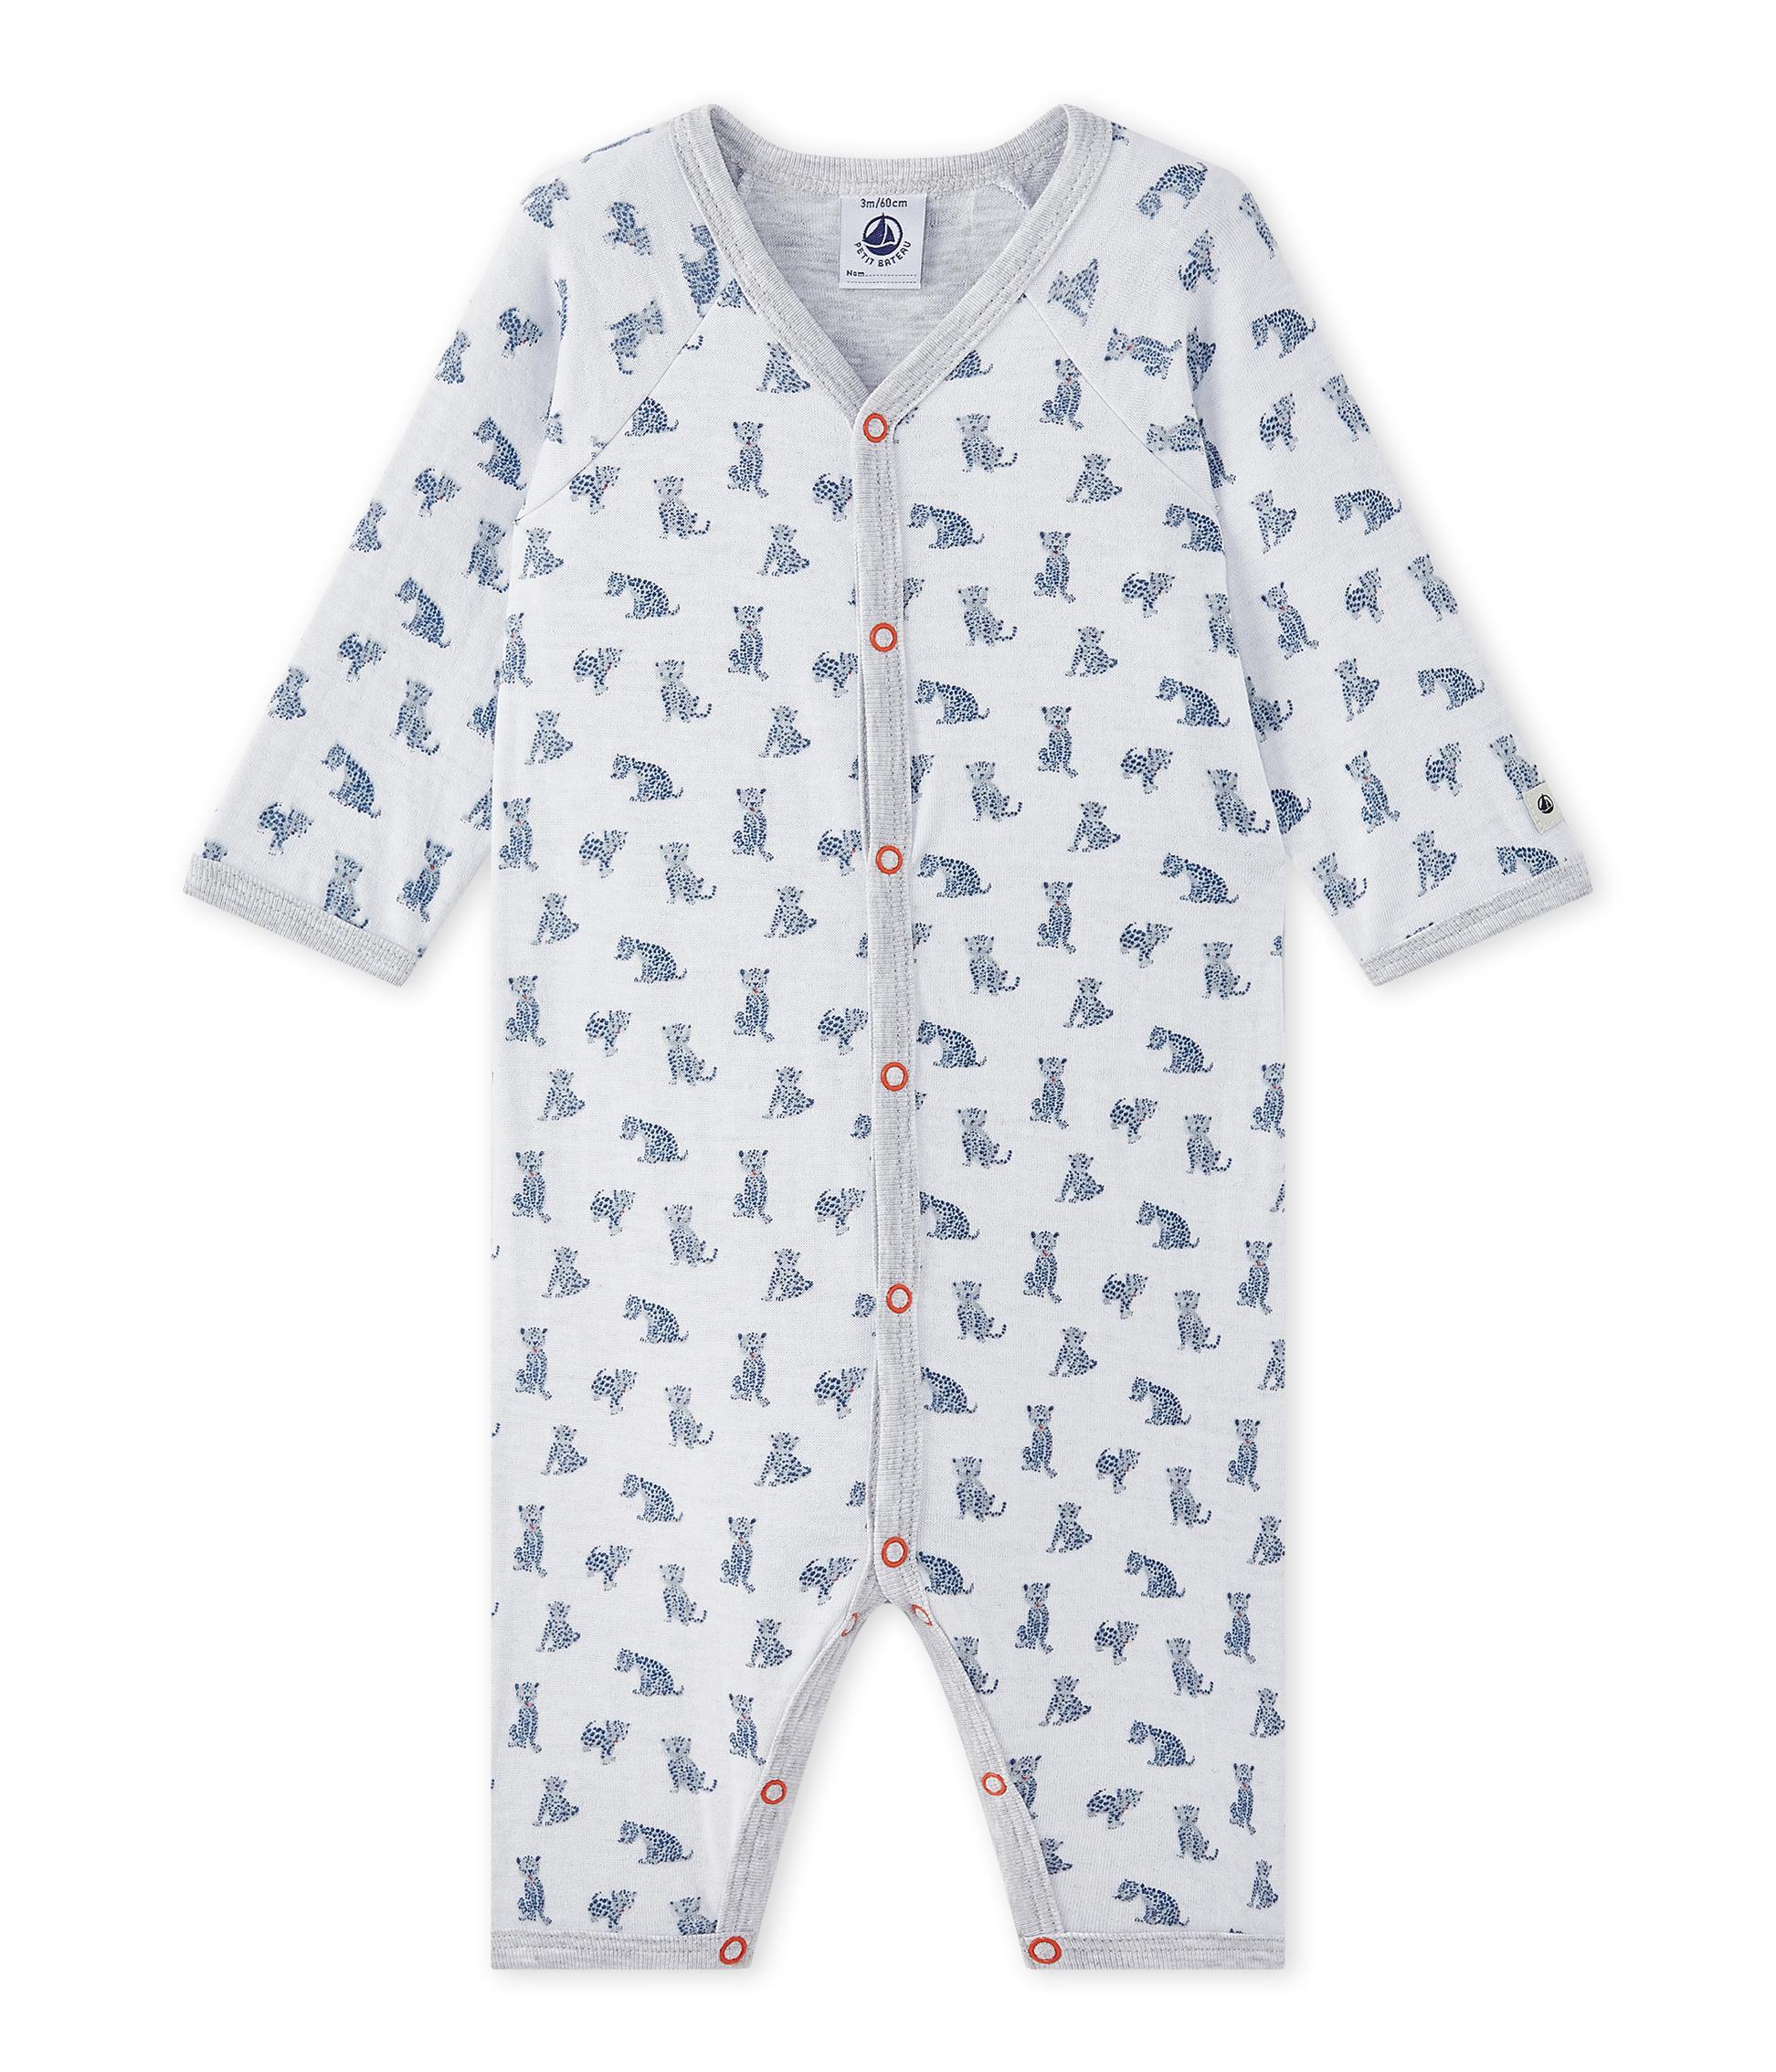 0bc9f64b2 Pijama sin pies en túbico para bebé niño | Petit Bateau